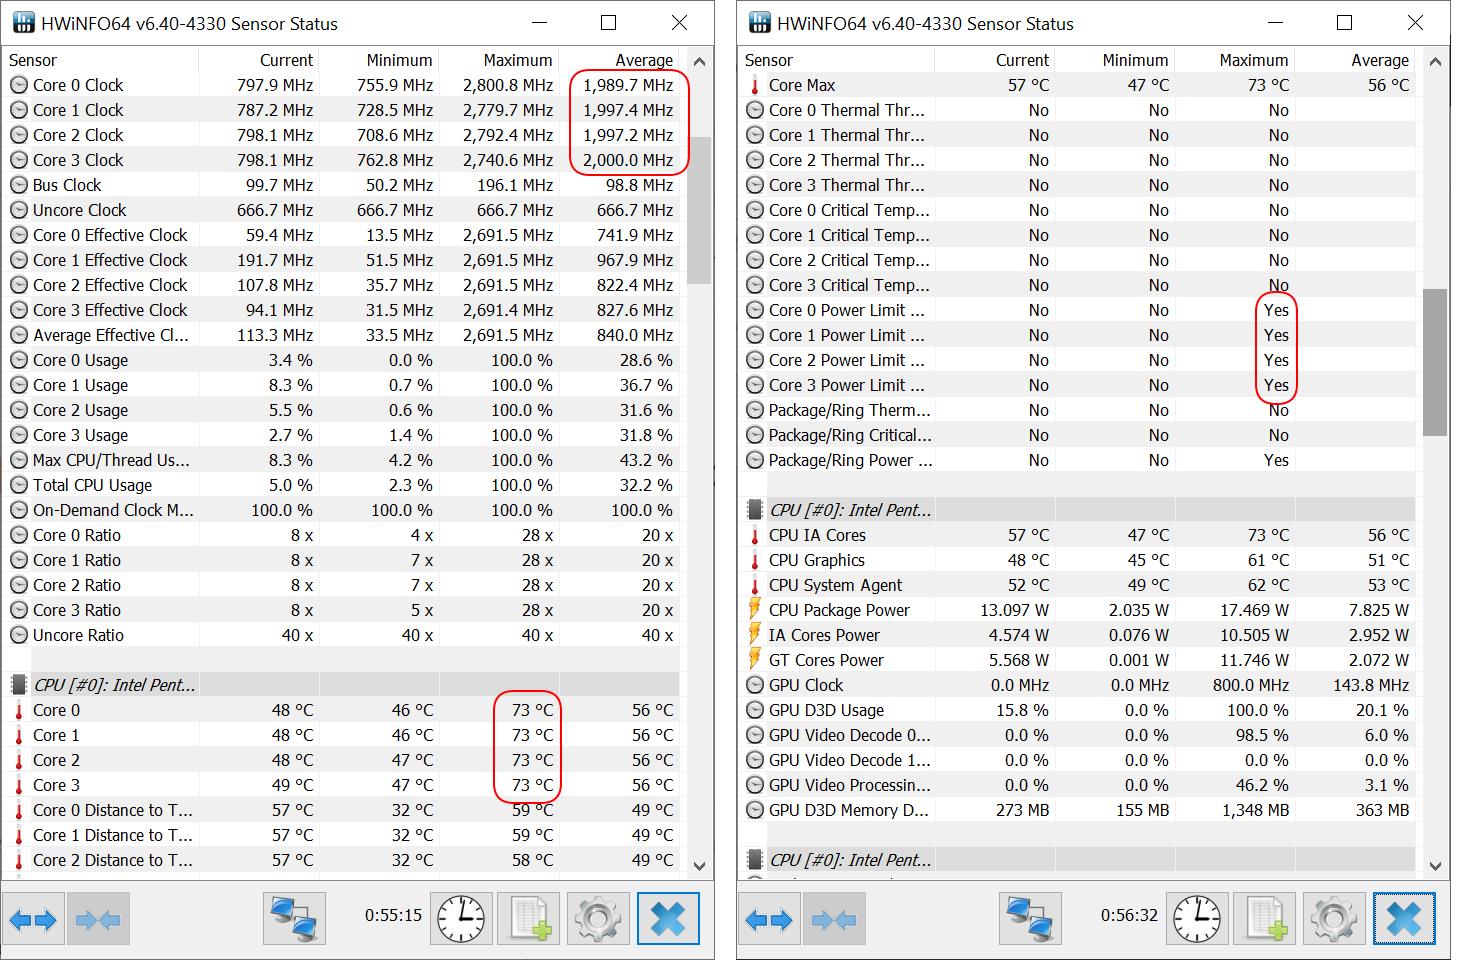 CPU Throttling Thermal vs Power